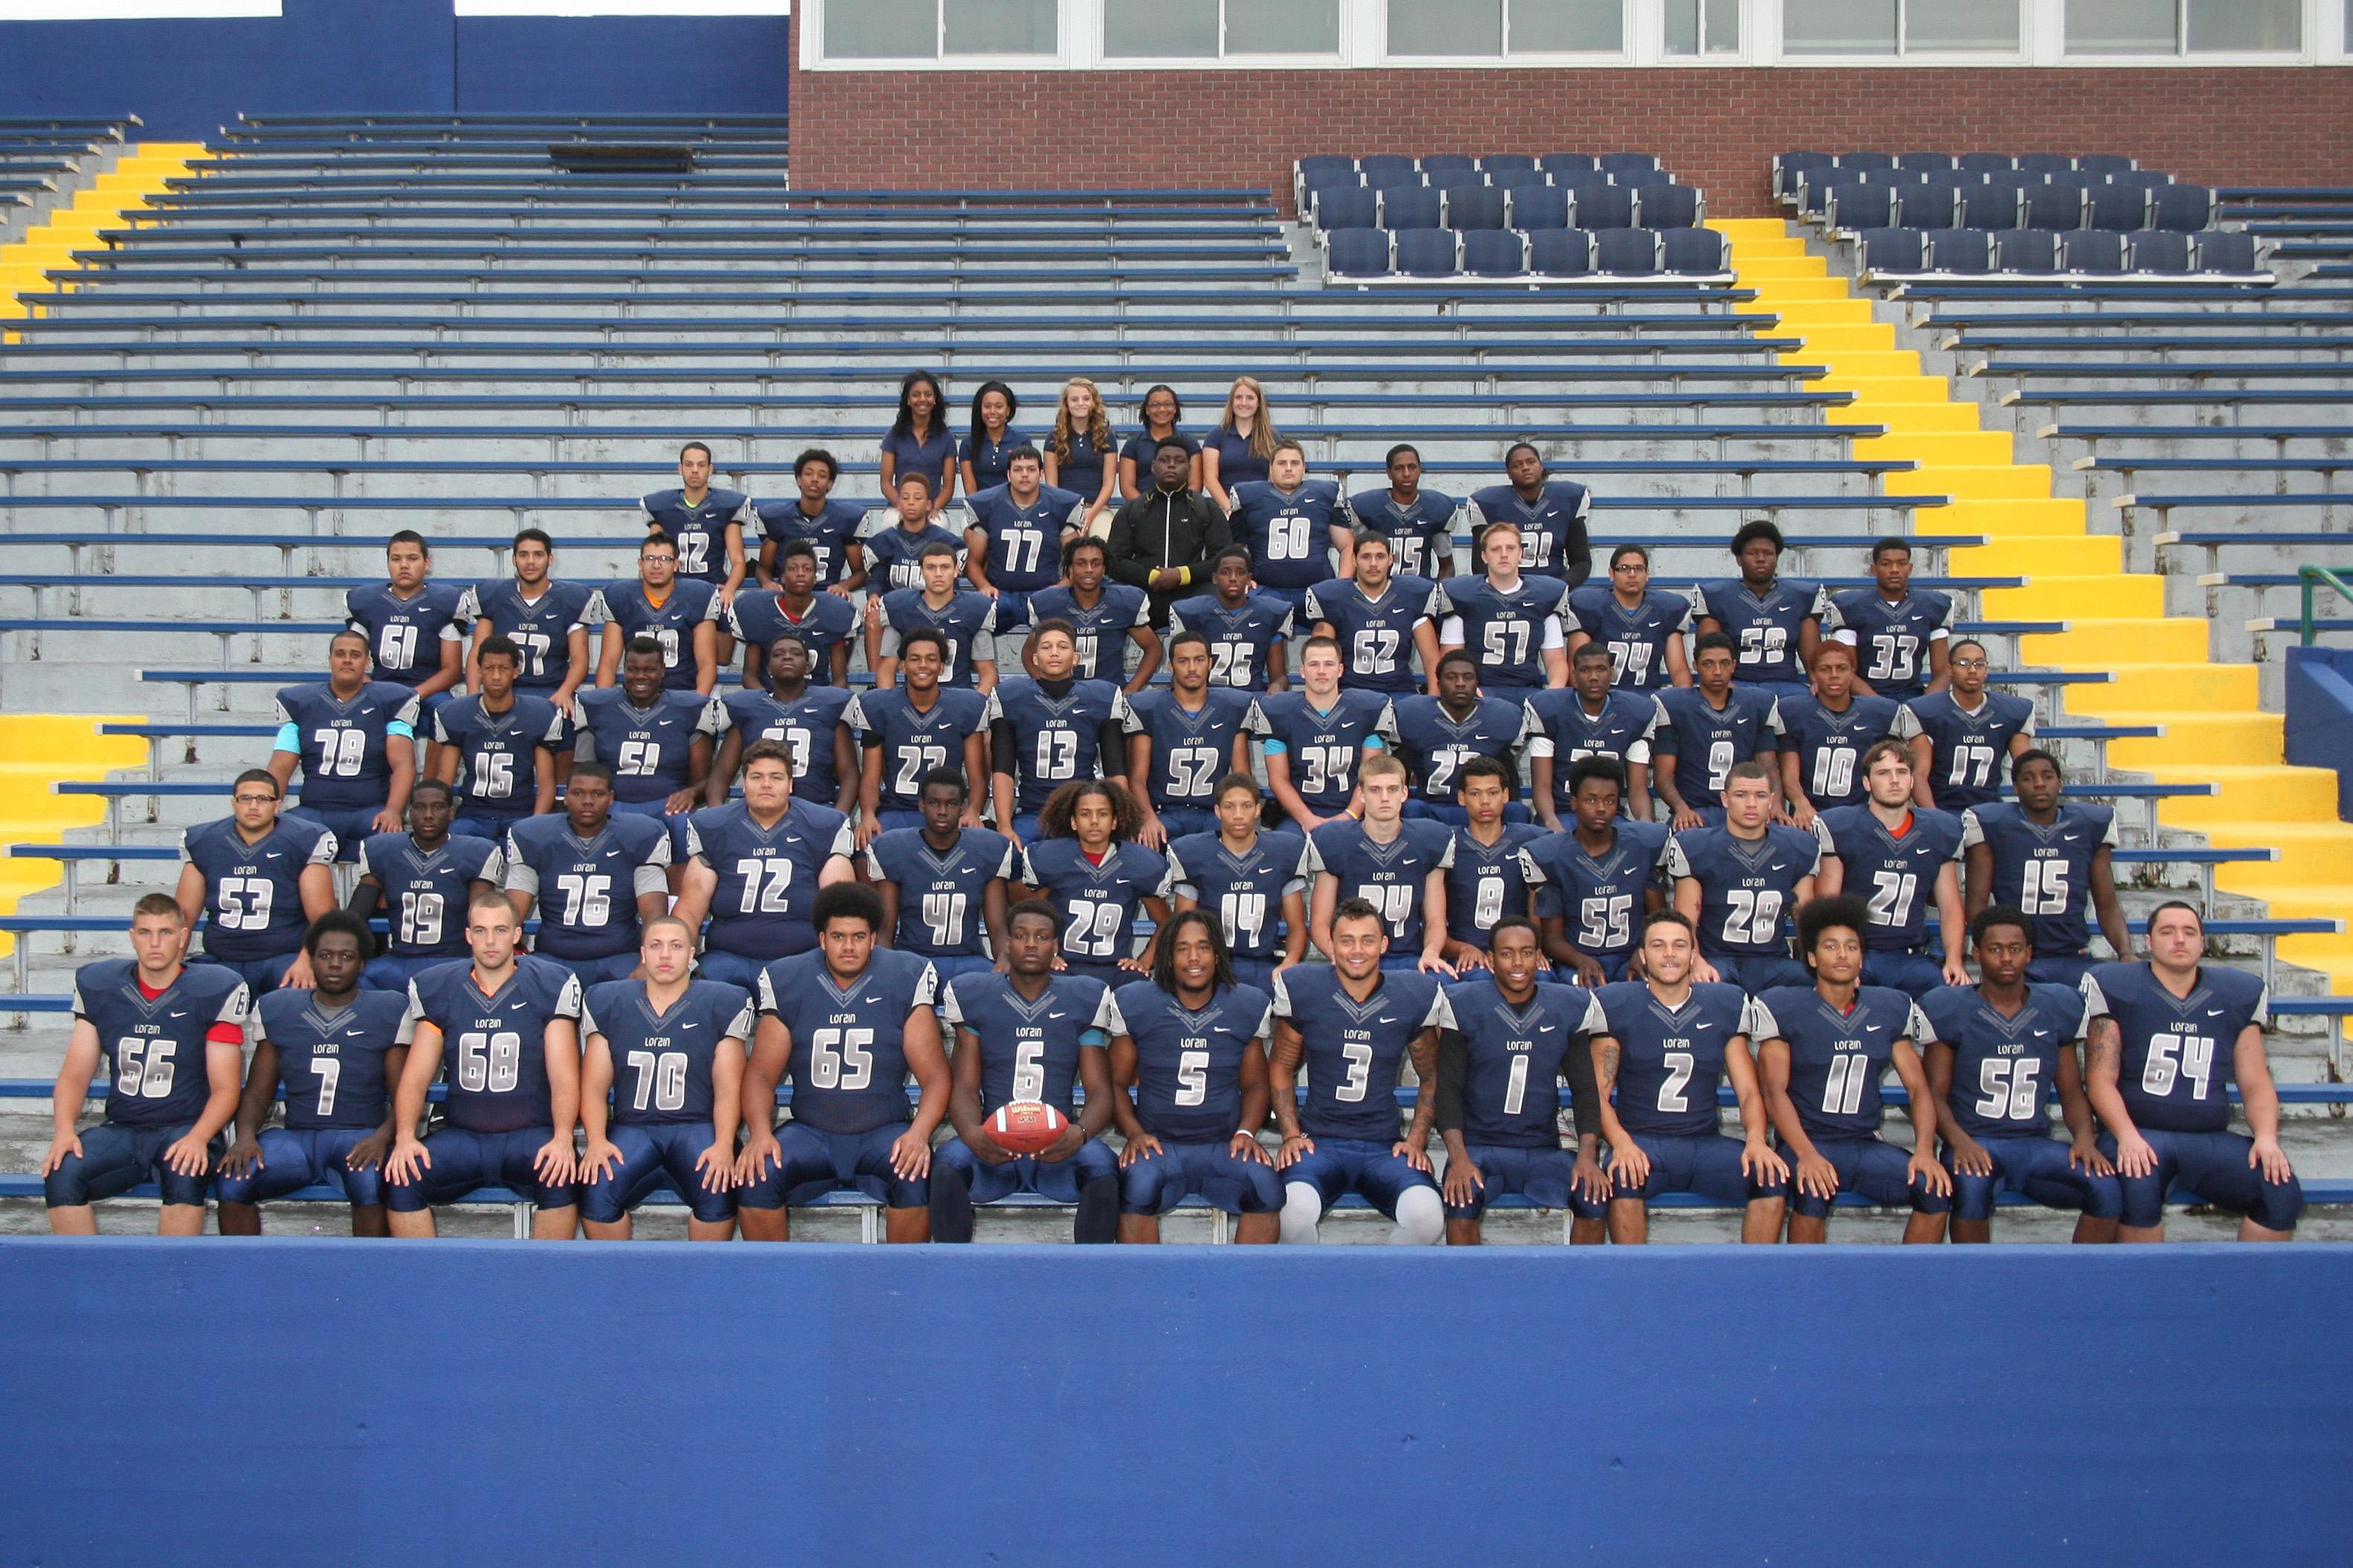 2014 Lorain High School varsity football team / Photo courtesy Lorain High School